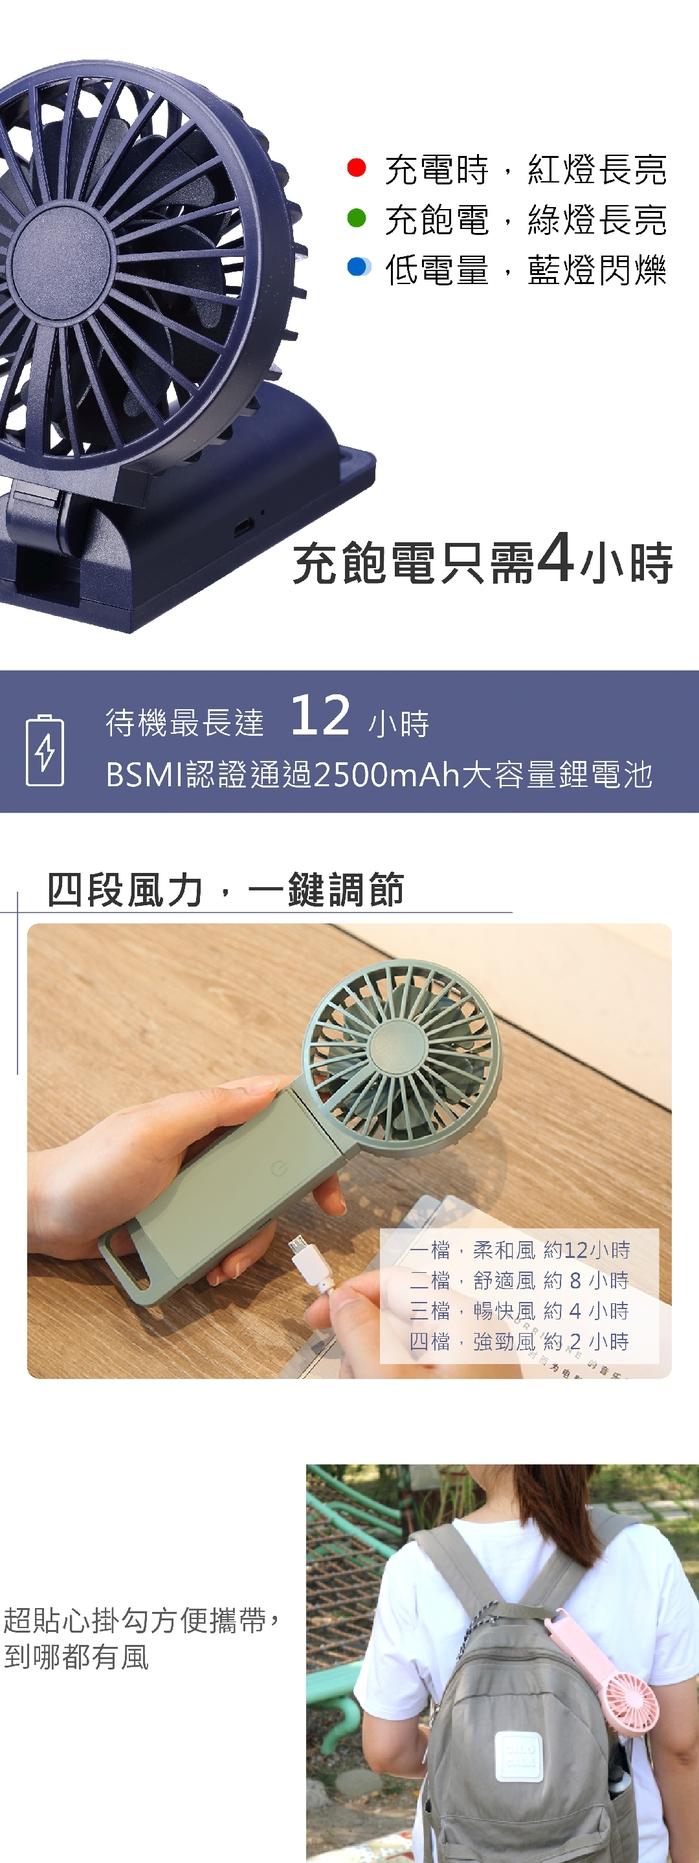 AIRMATE USB 掛扣手持雙葉扇UD801(莓玫粉)